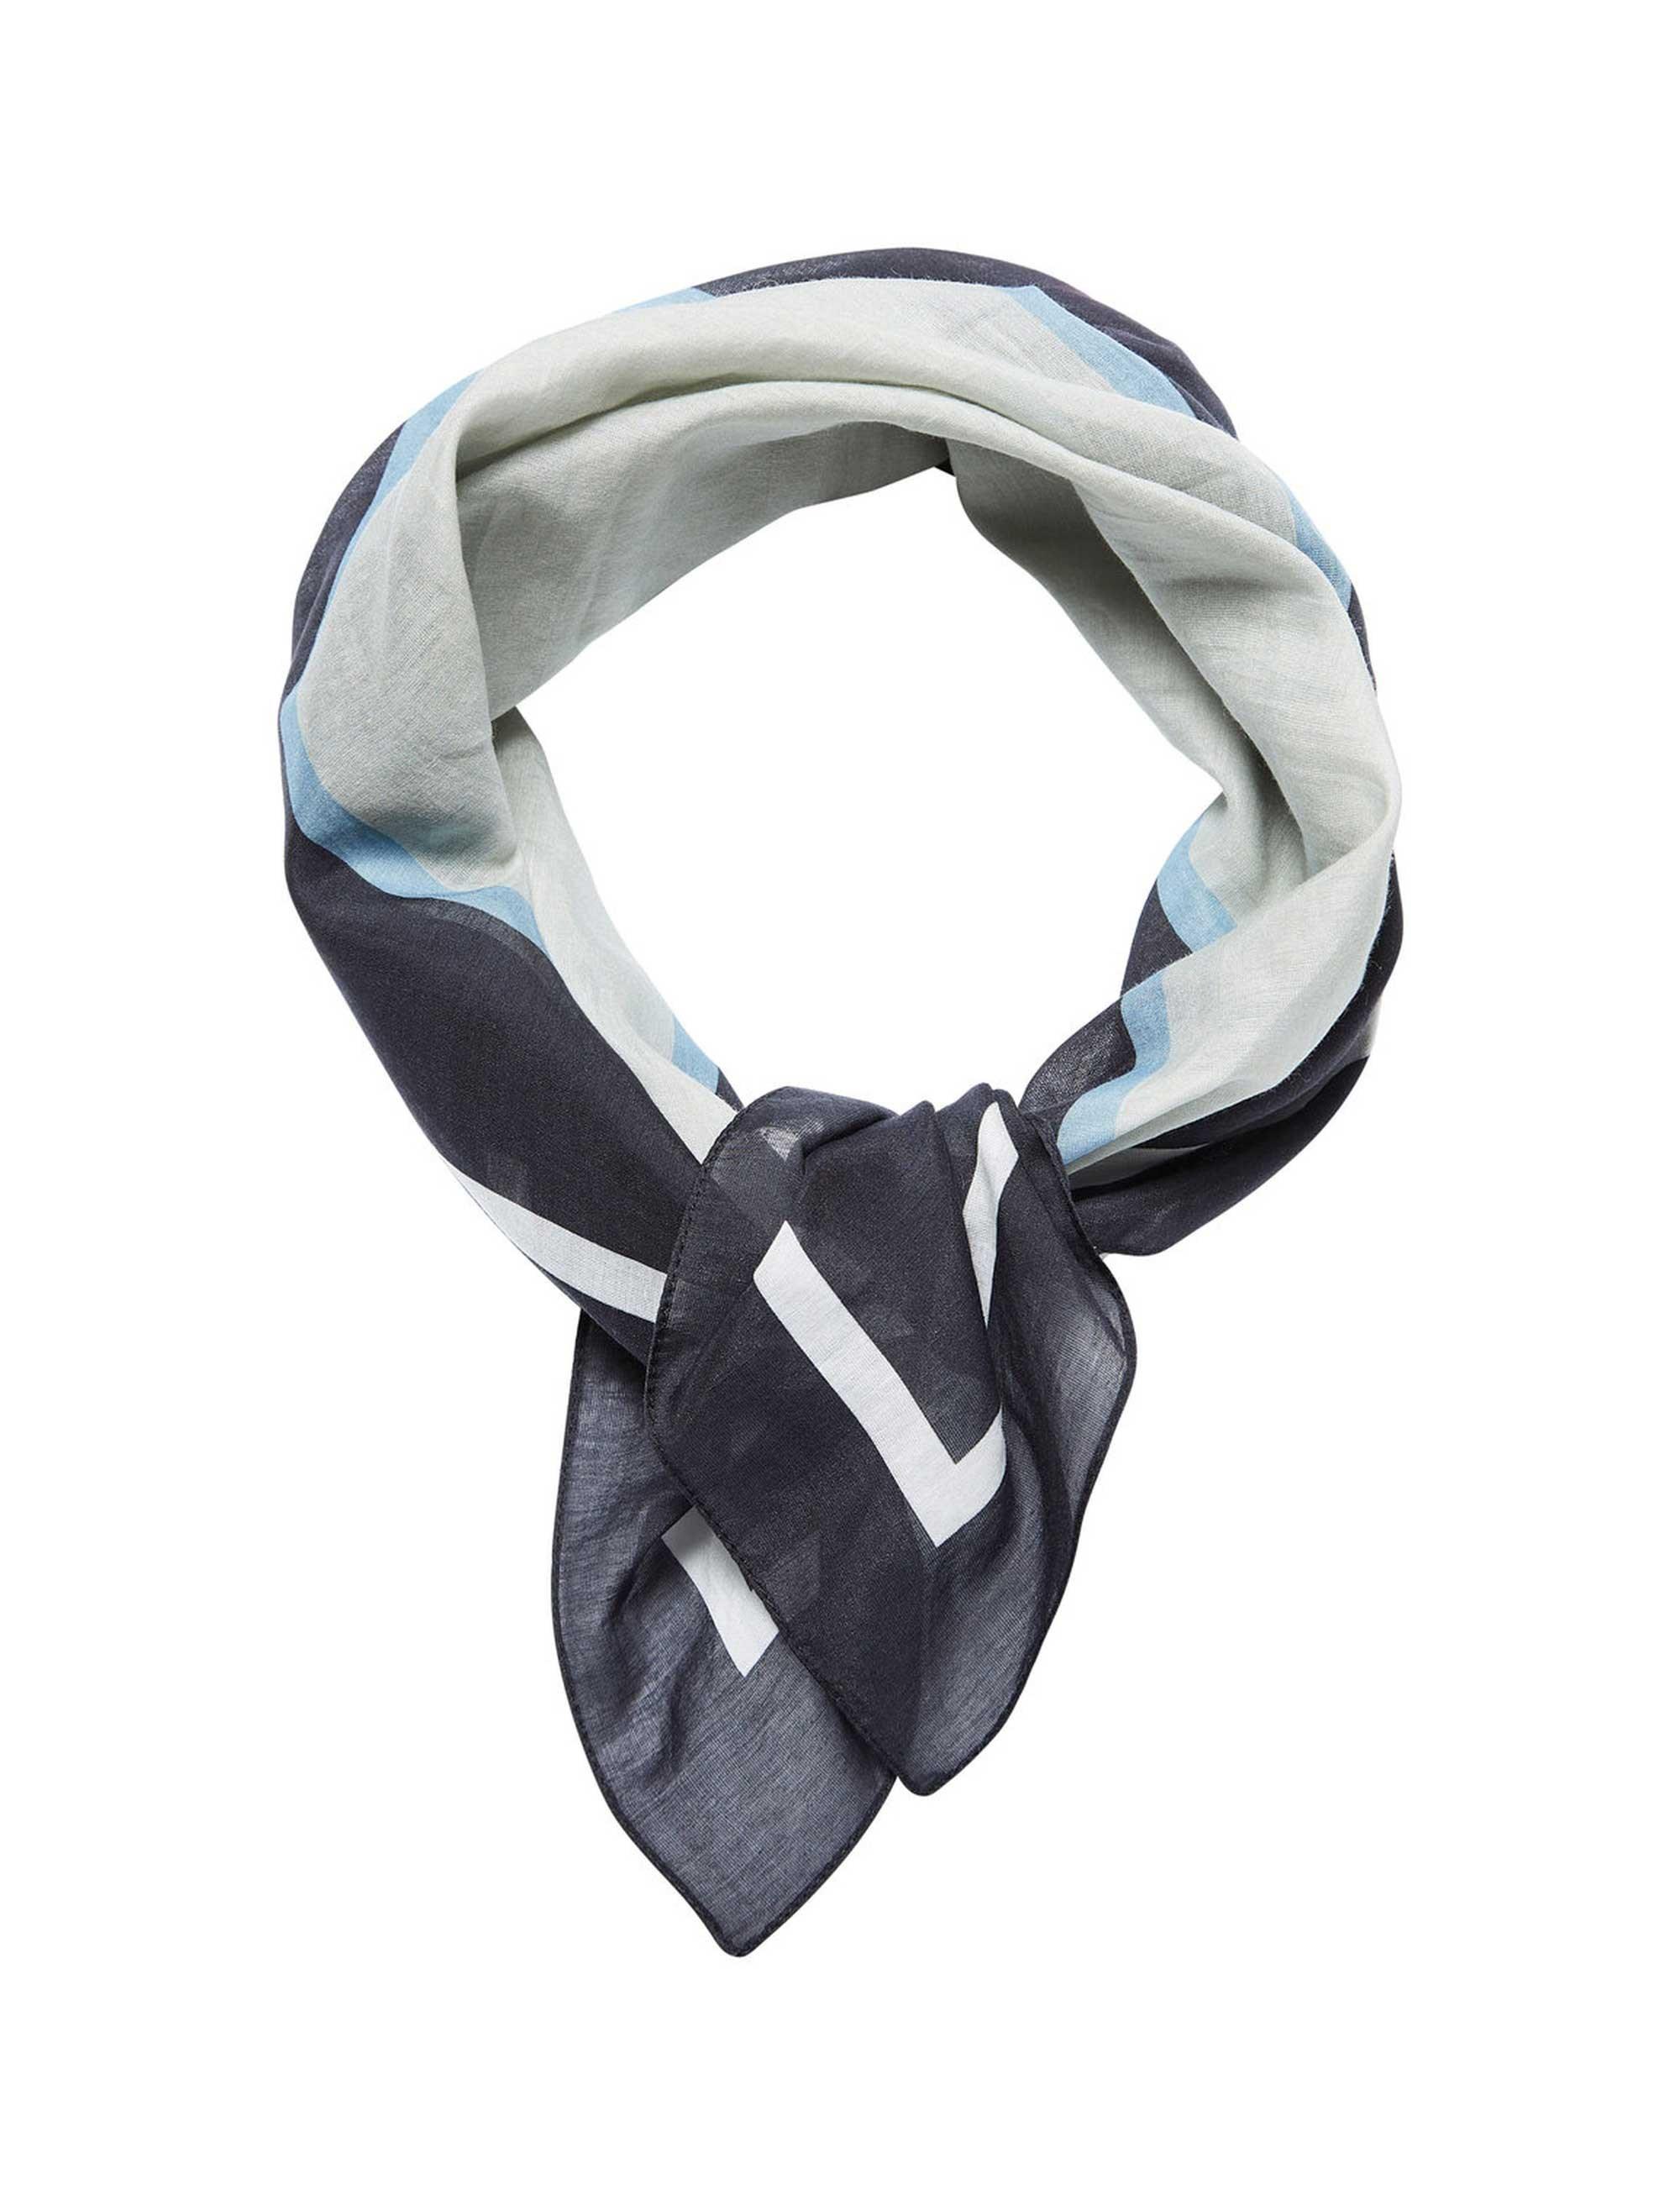 قیمت روسری نخی طرح دار زنانه - سلکتد